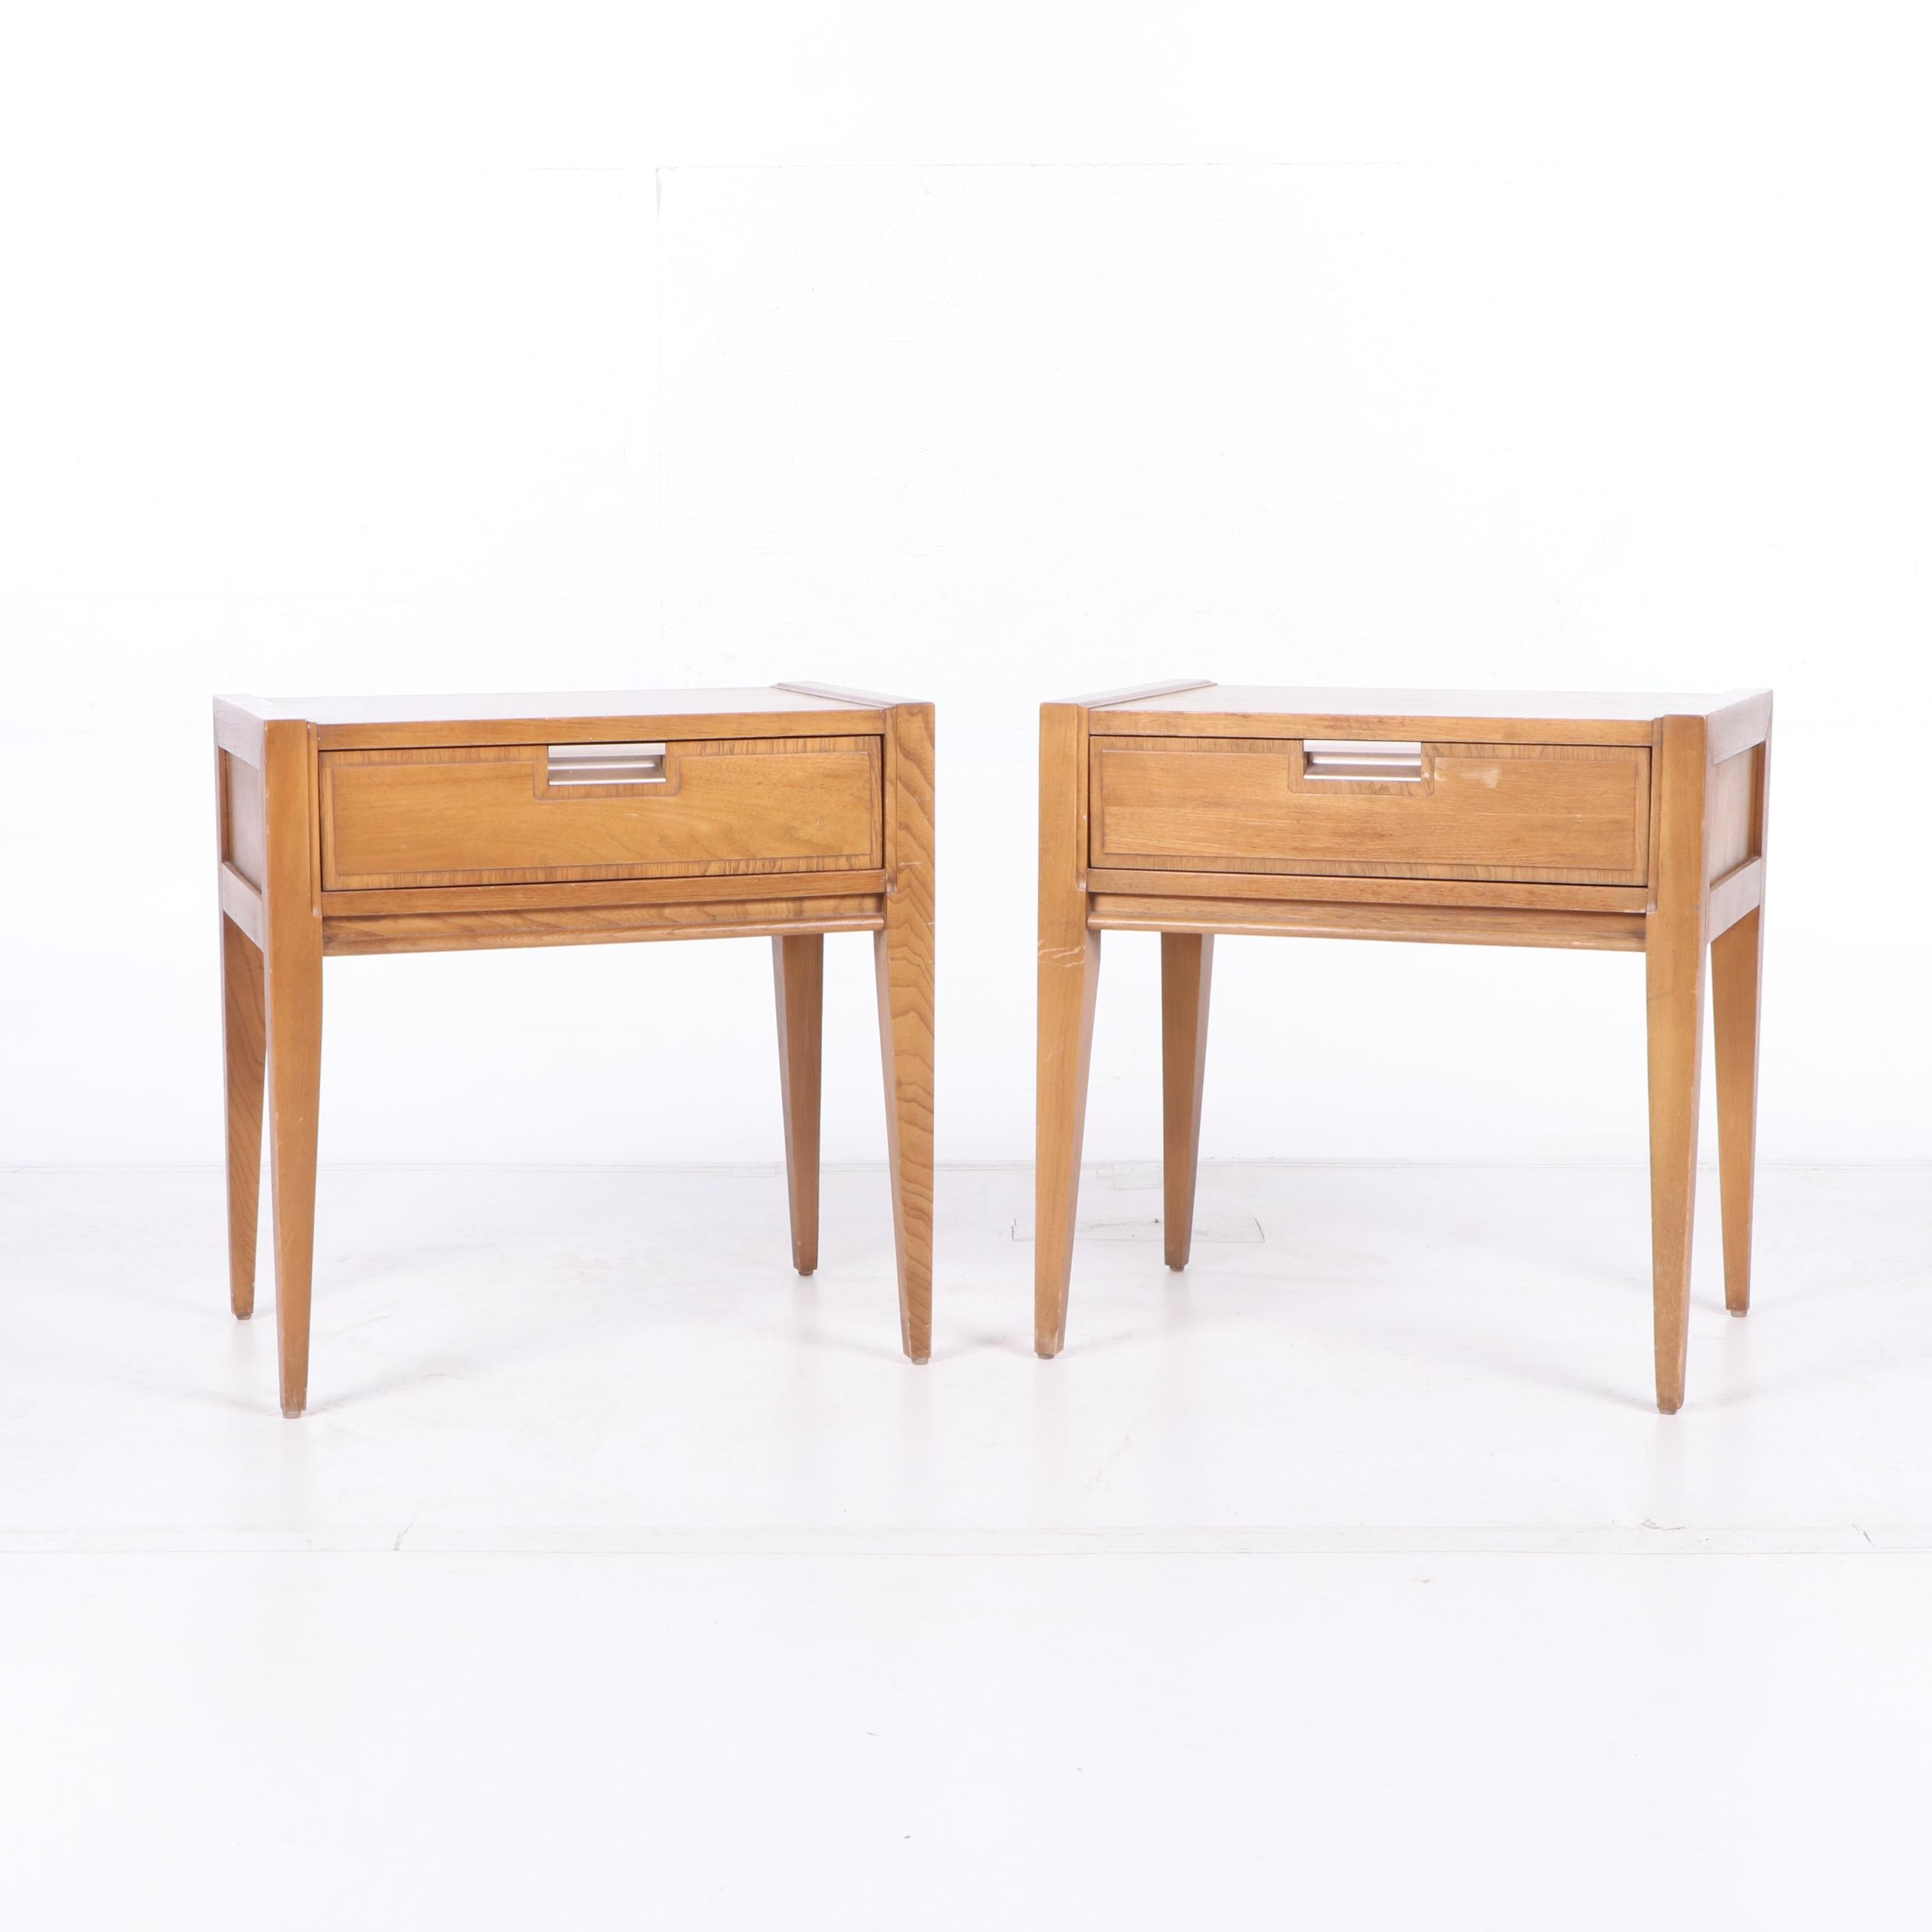 Basic-Witz Mid-Century Pecan Wood Side Tables